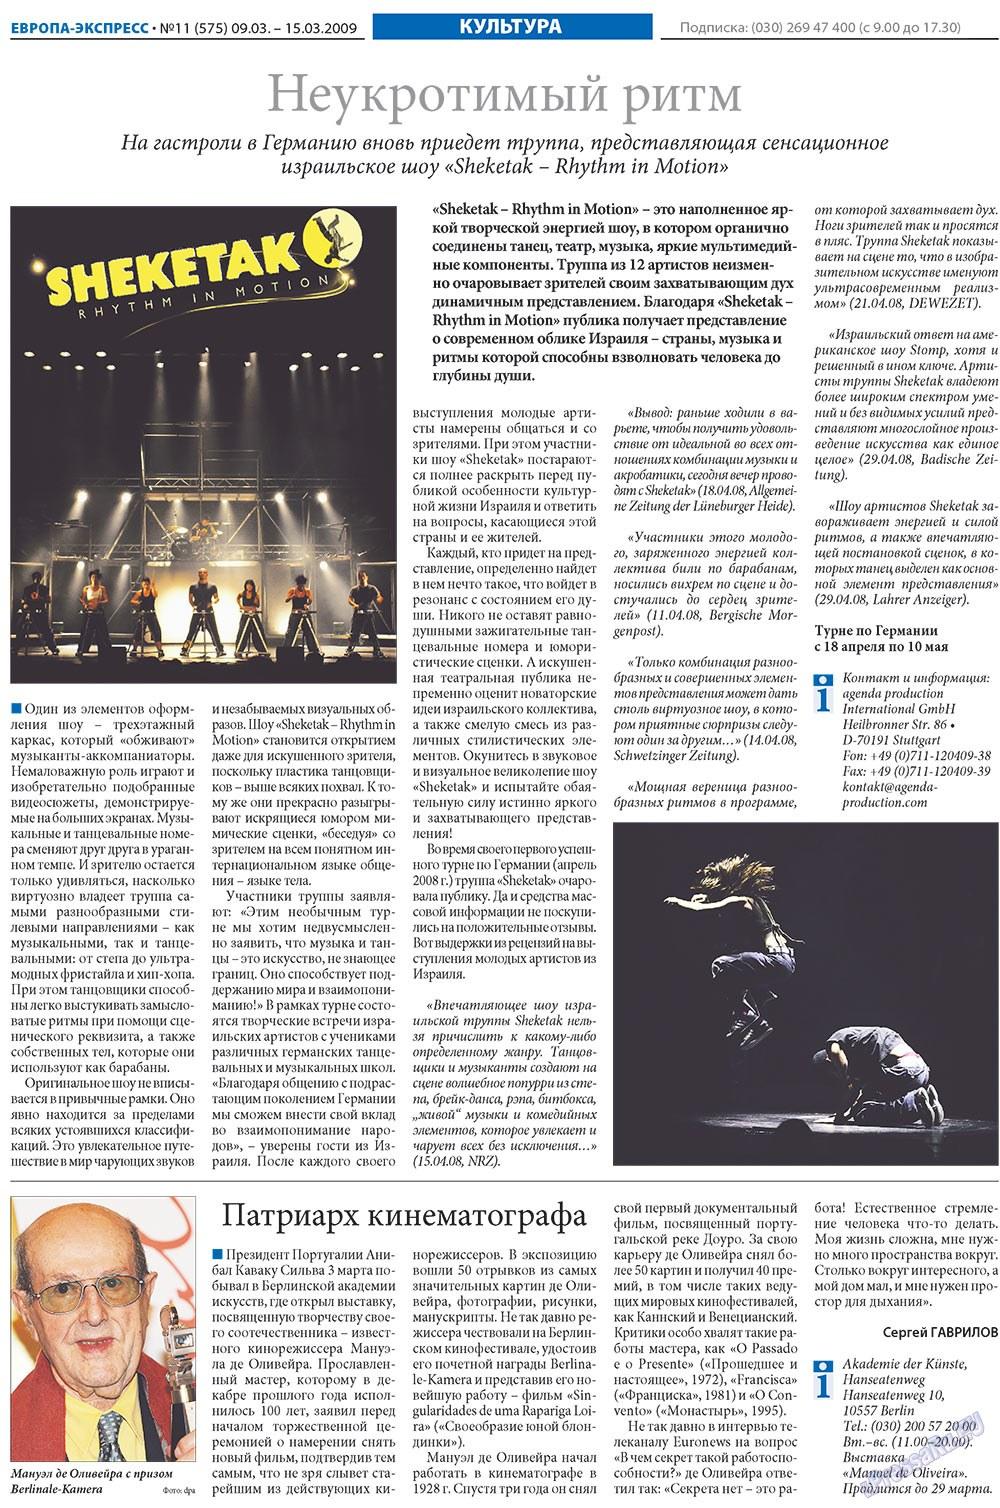 Европа экспресс (газета). 2009 год, номер 11, стр. 21